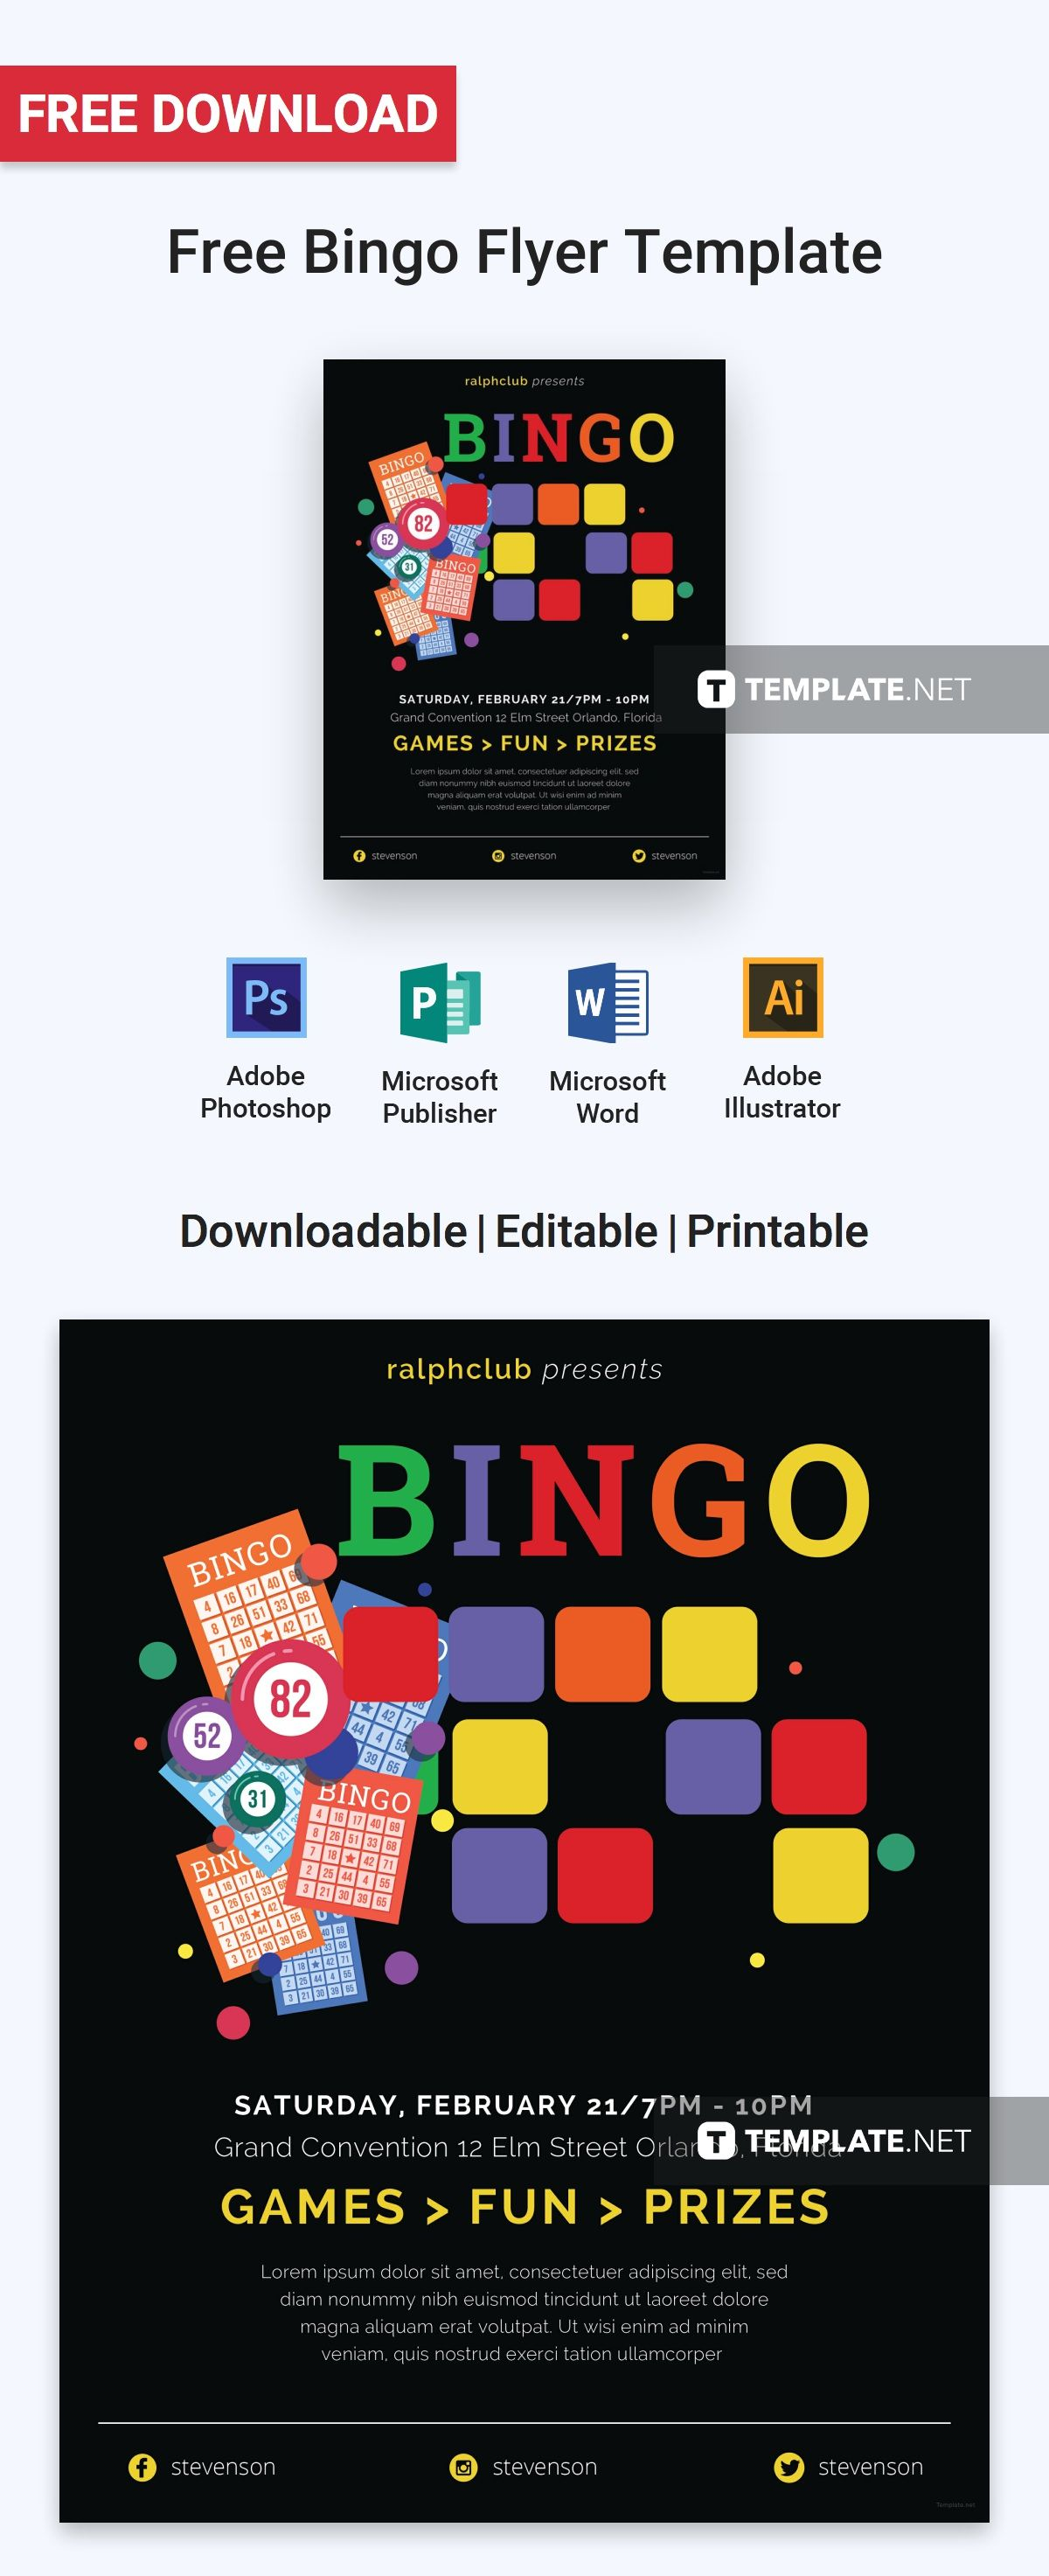 Bingo Flyer Template Free Jpg Illustrator Word Apple Pages Psd Publisher Template Net Flyer Template Flyer Flyer Layout